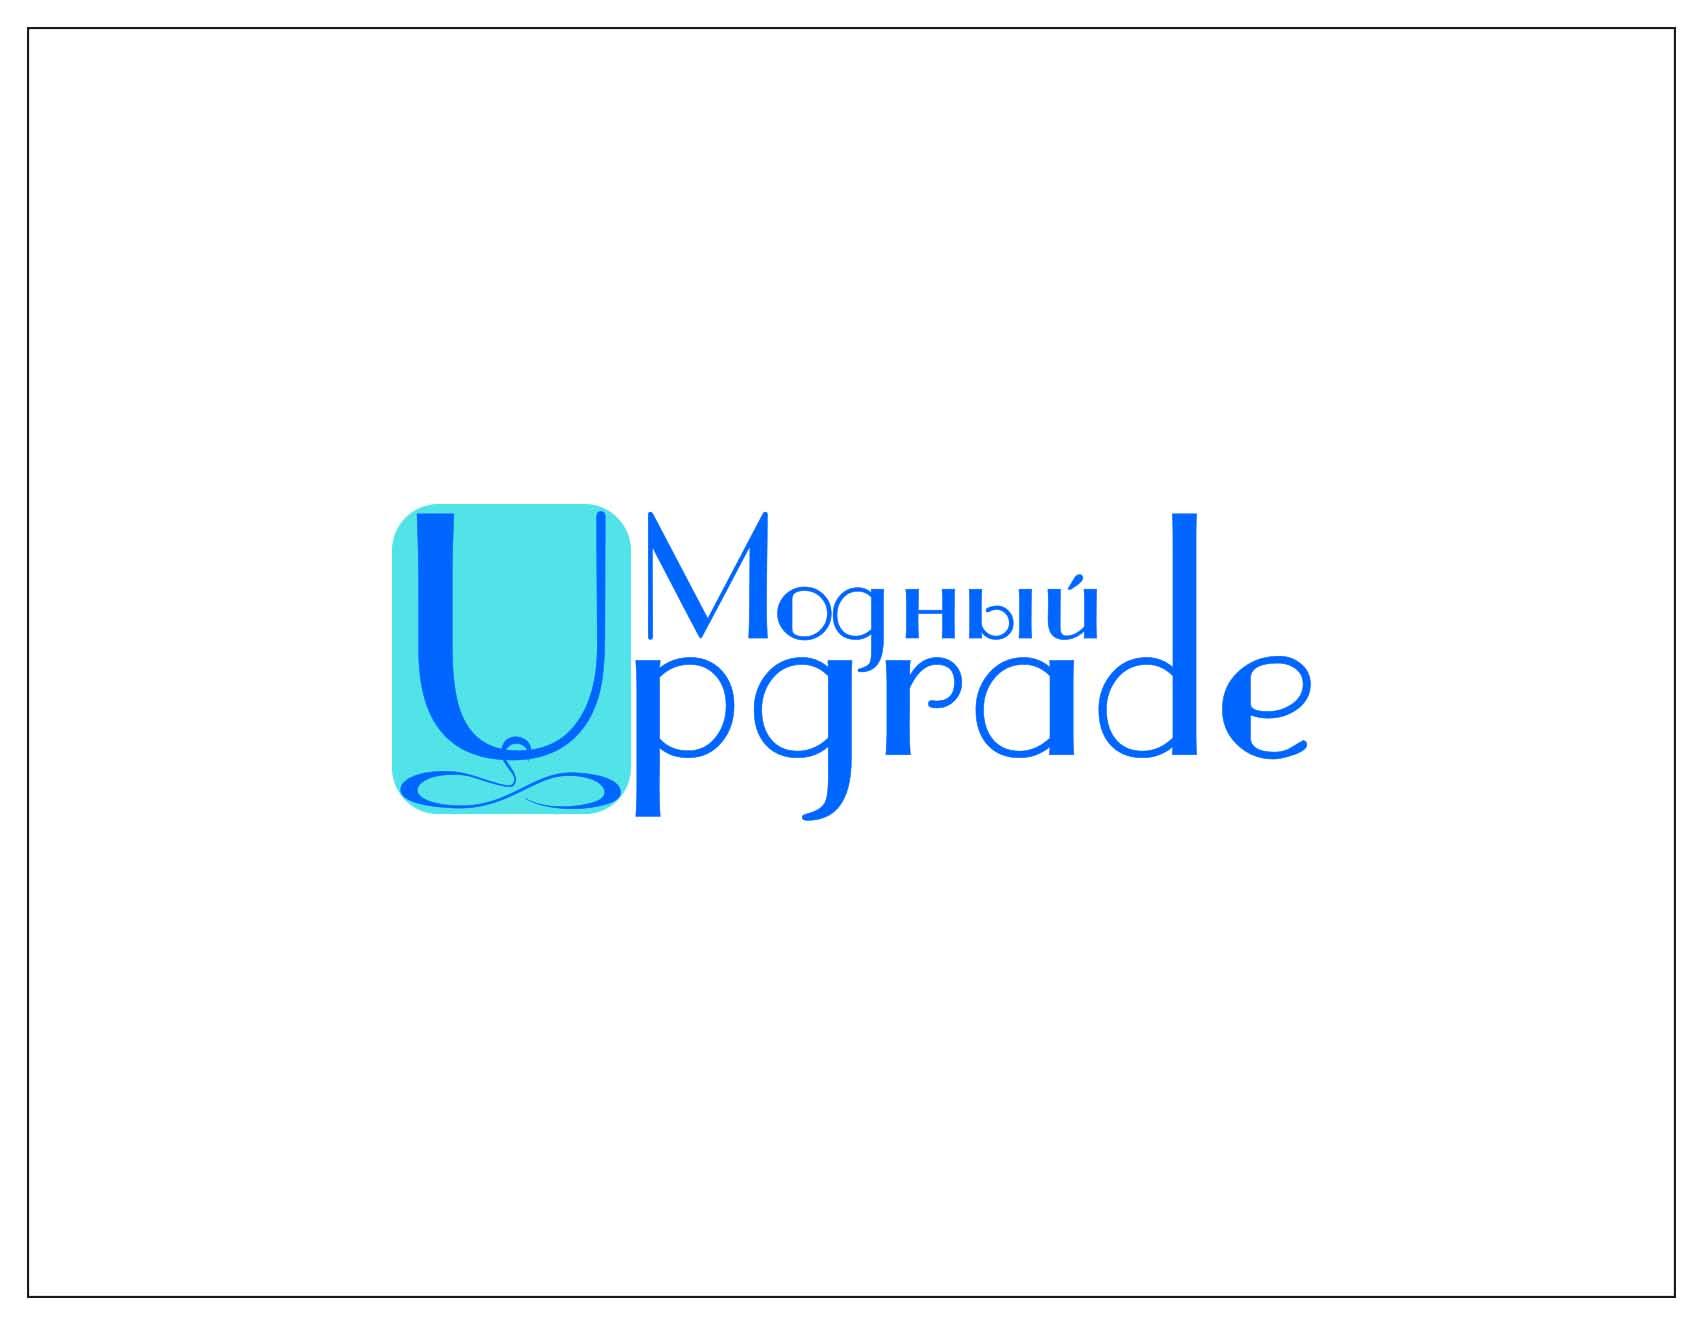 "Логотип интернет магазина ""Модный UPGRADE"" фото f_41859439e3242ec1.jpg"